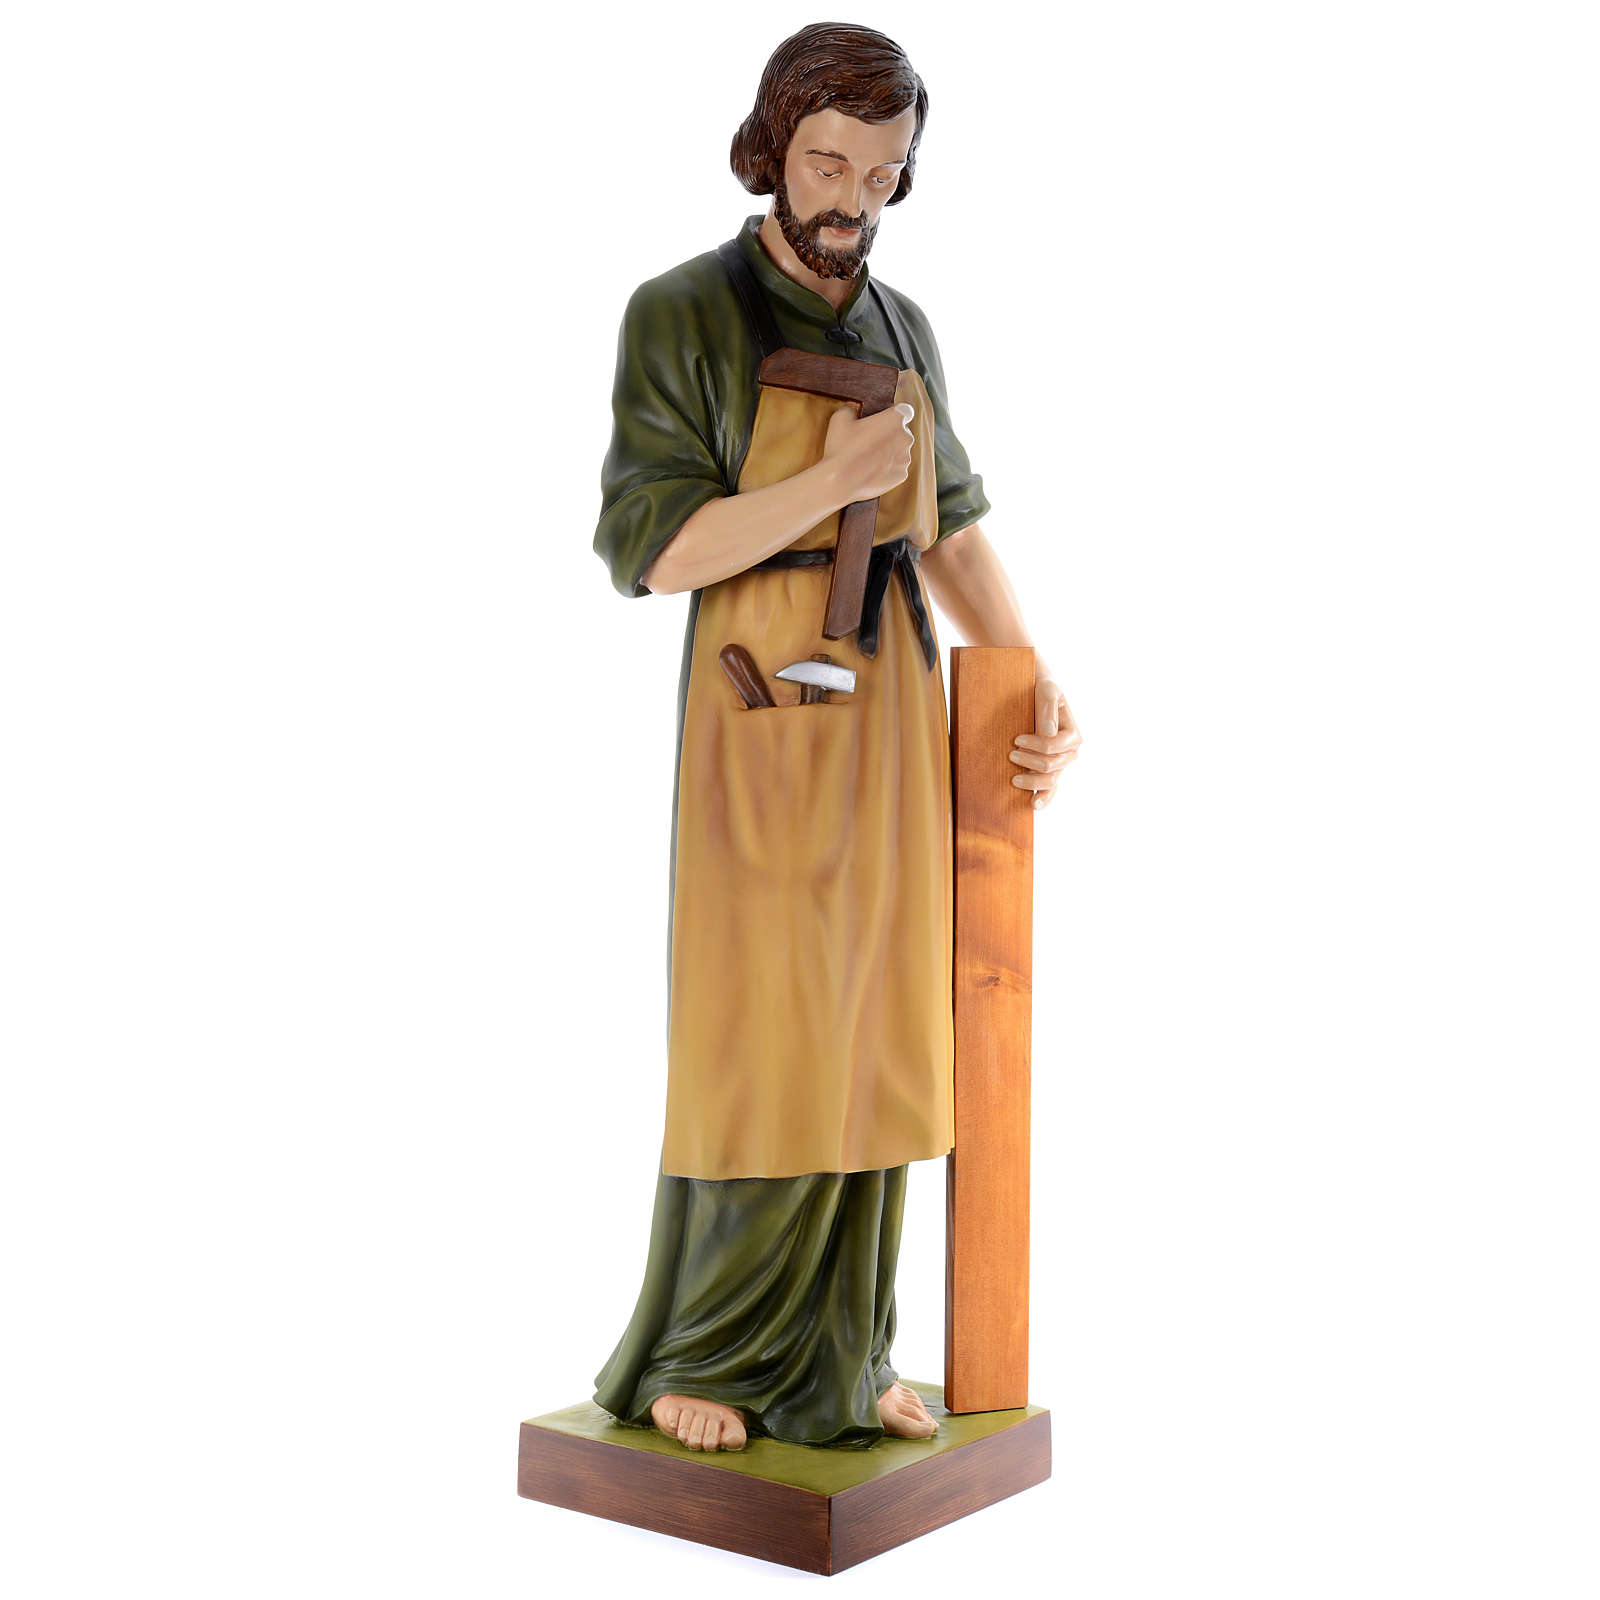 Statua San Giuseppe falegname 150 cm vetroresina colorata PER ESTERNO 4